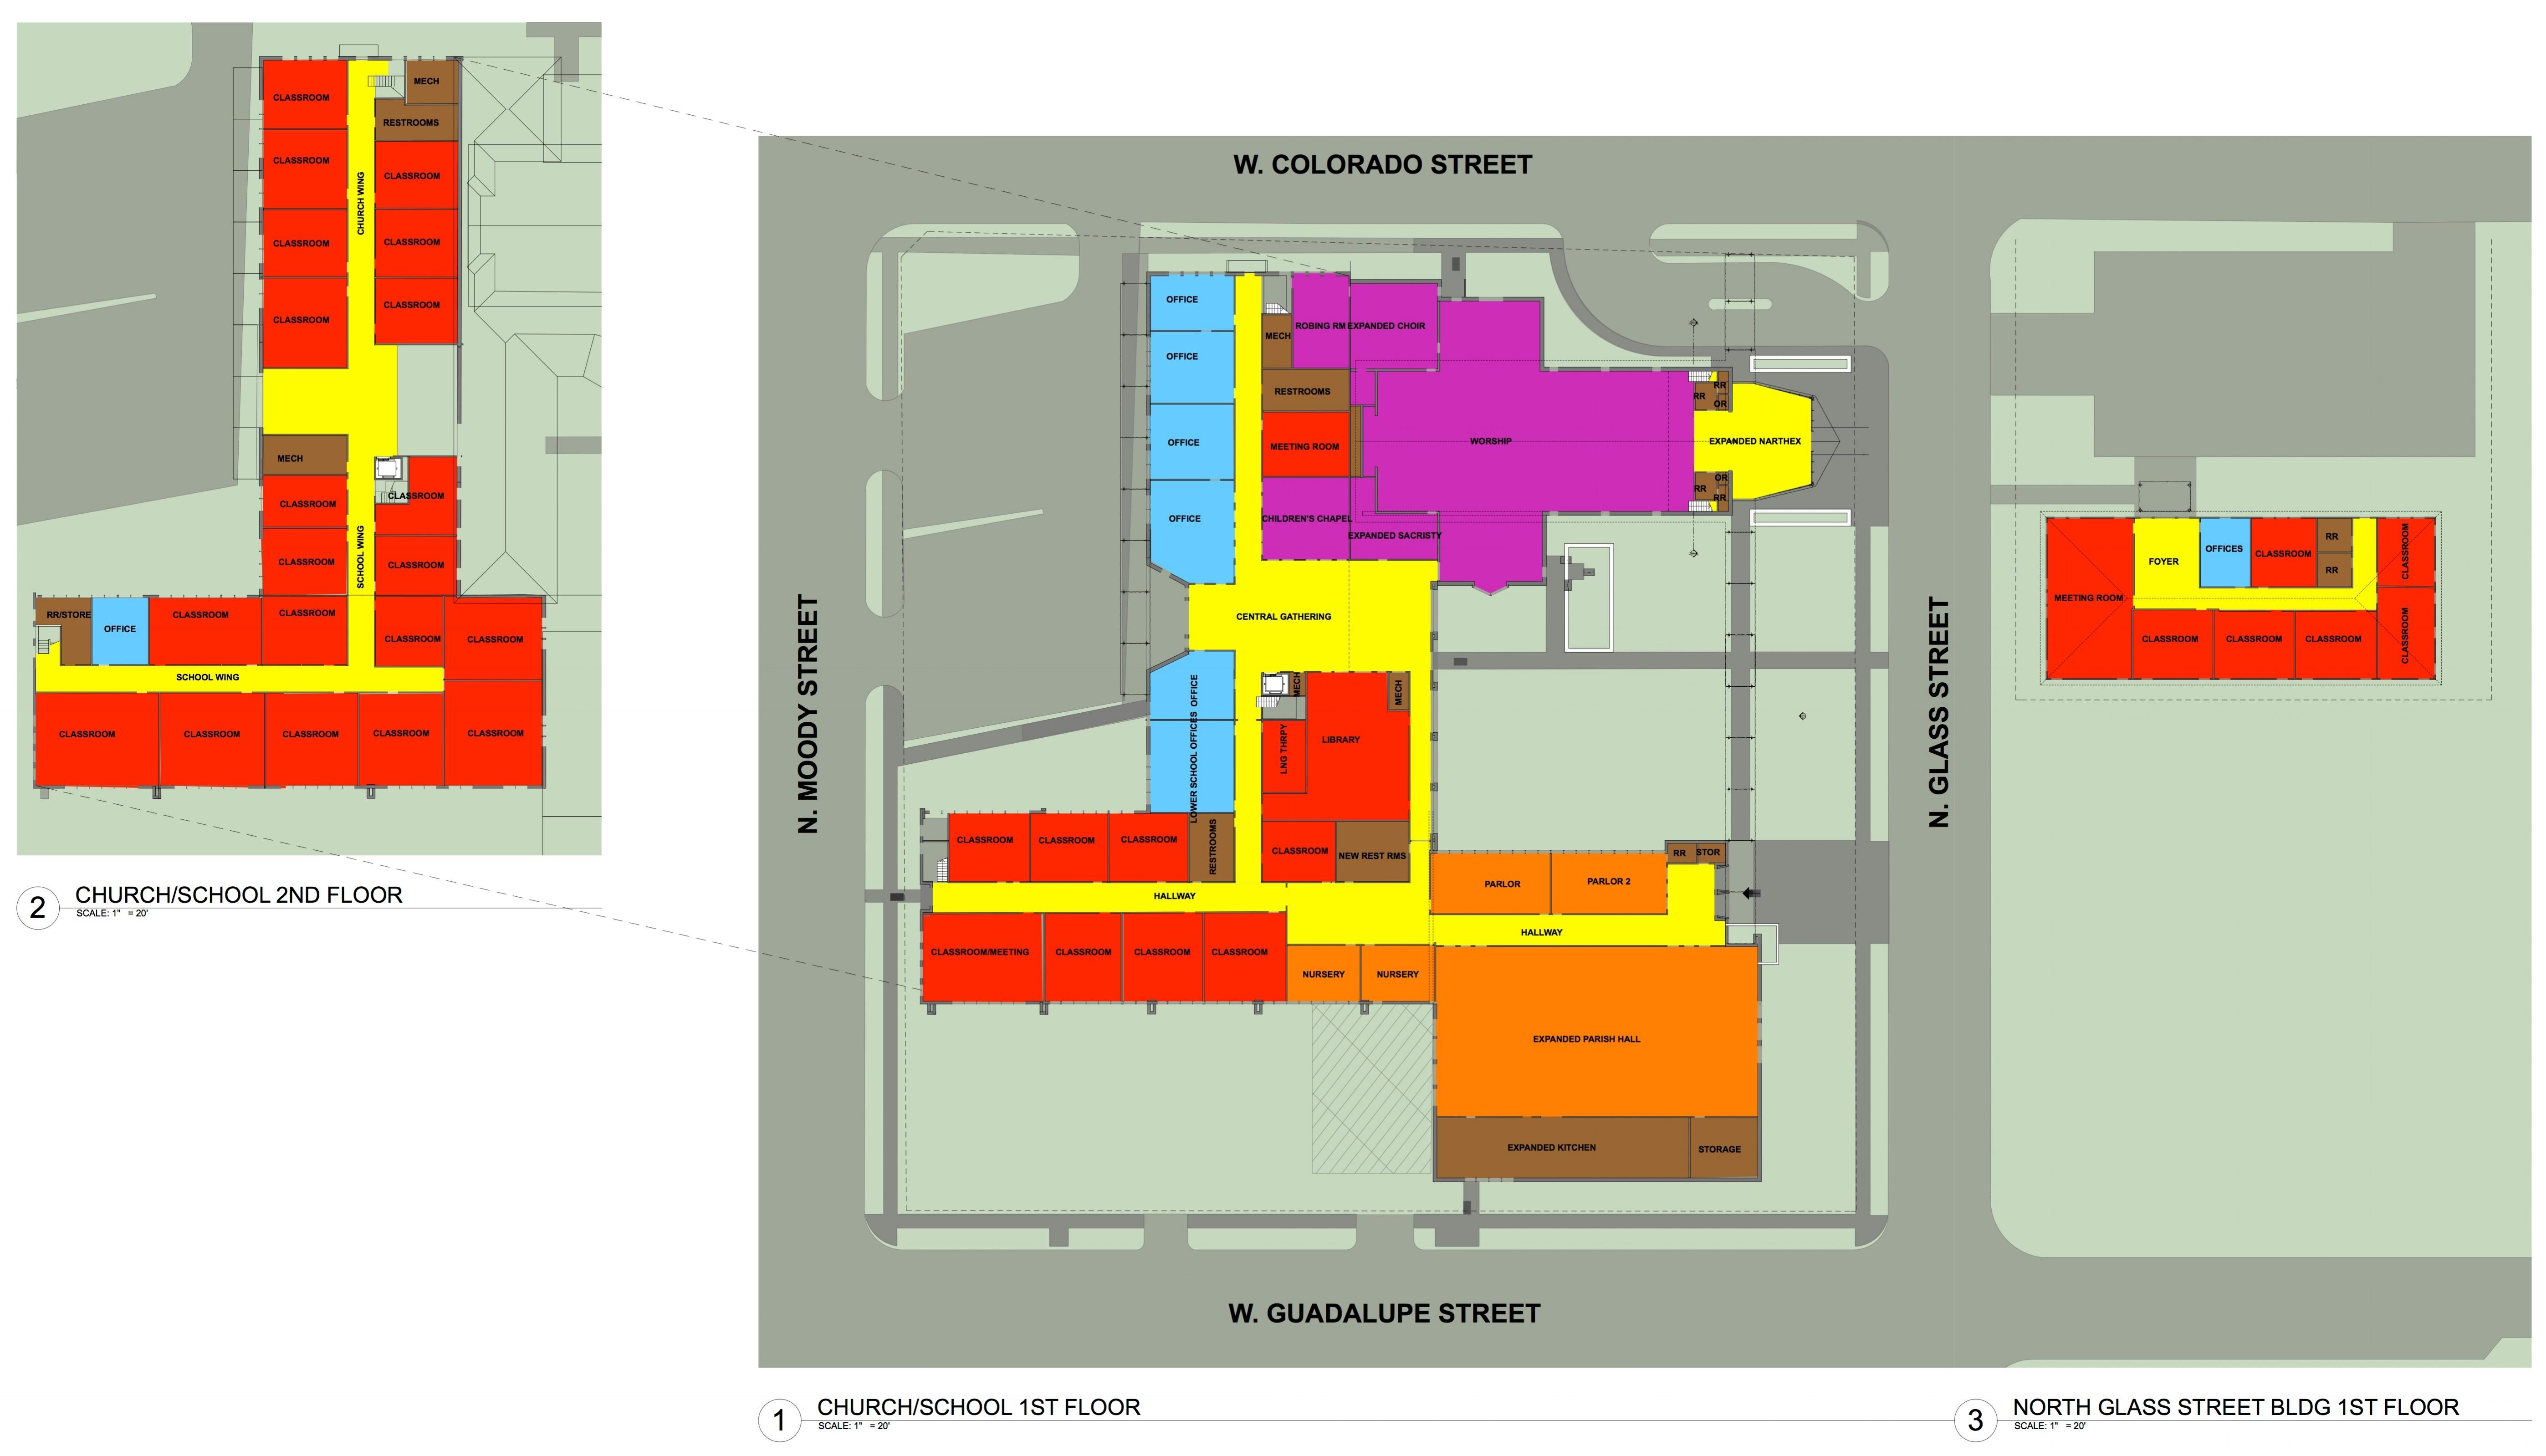 Master_Plan_plans-142407-edited.jpg